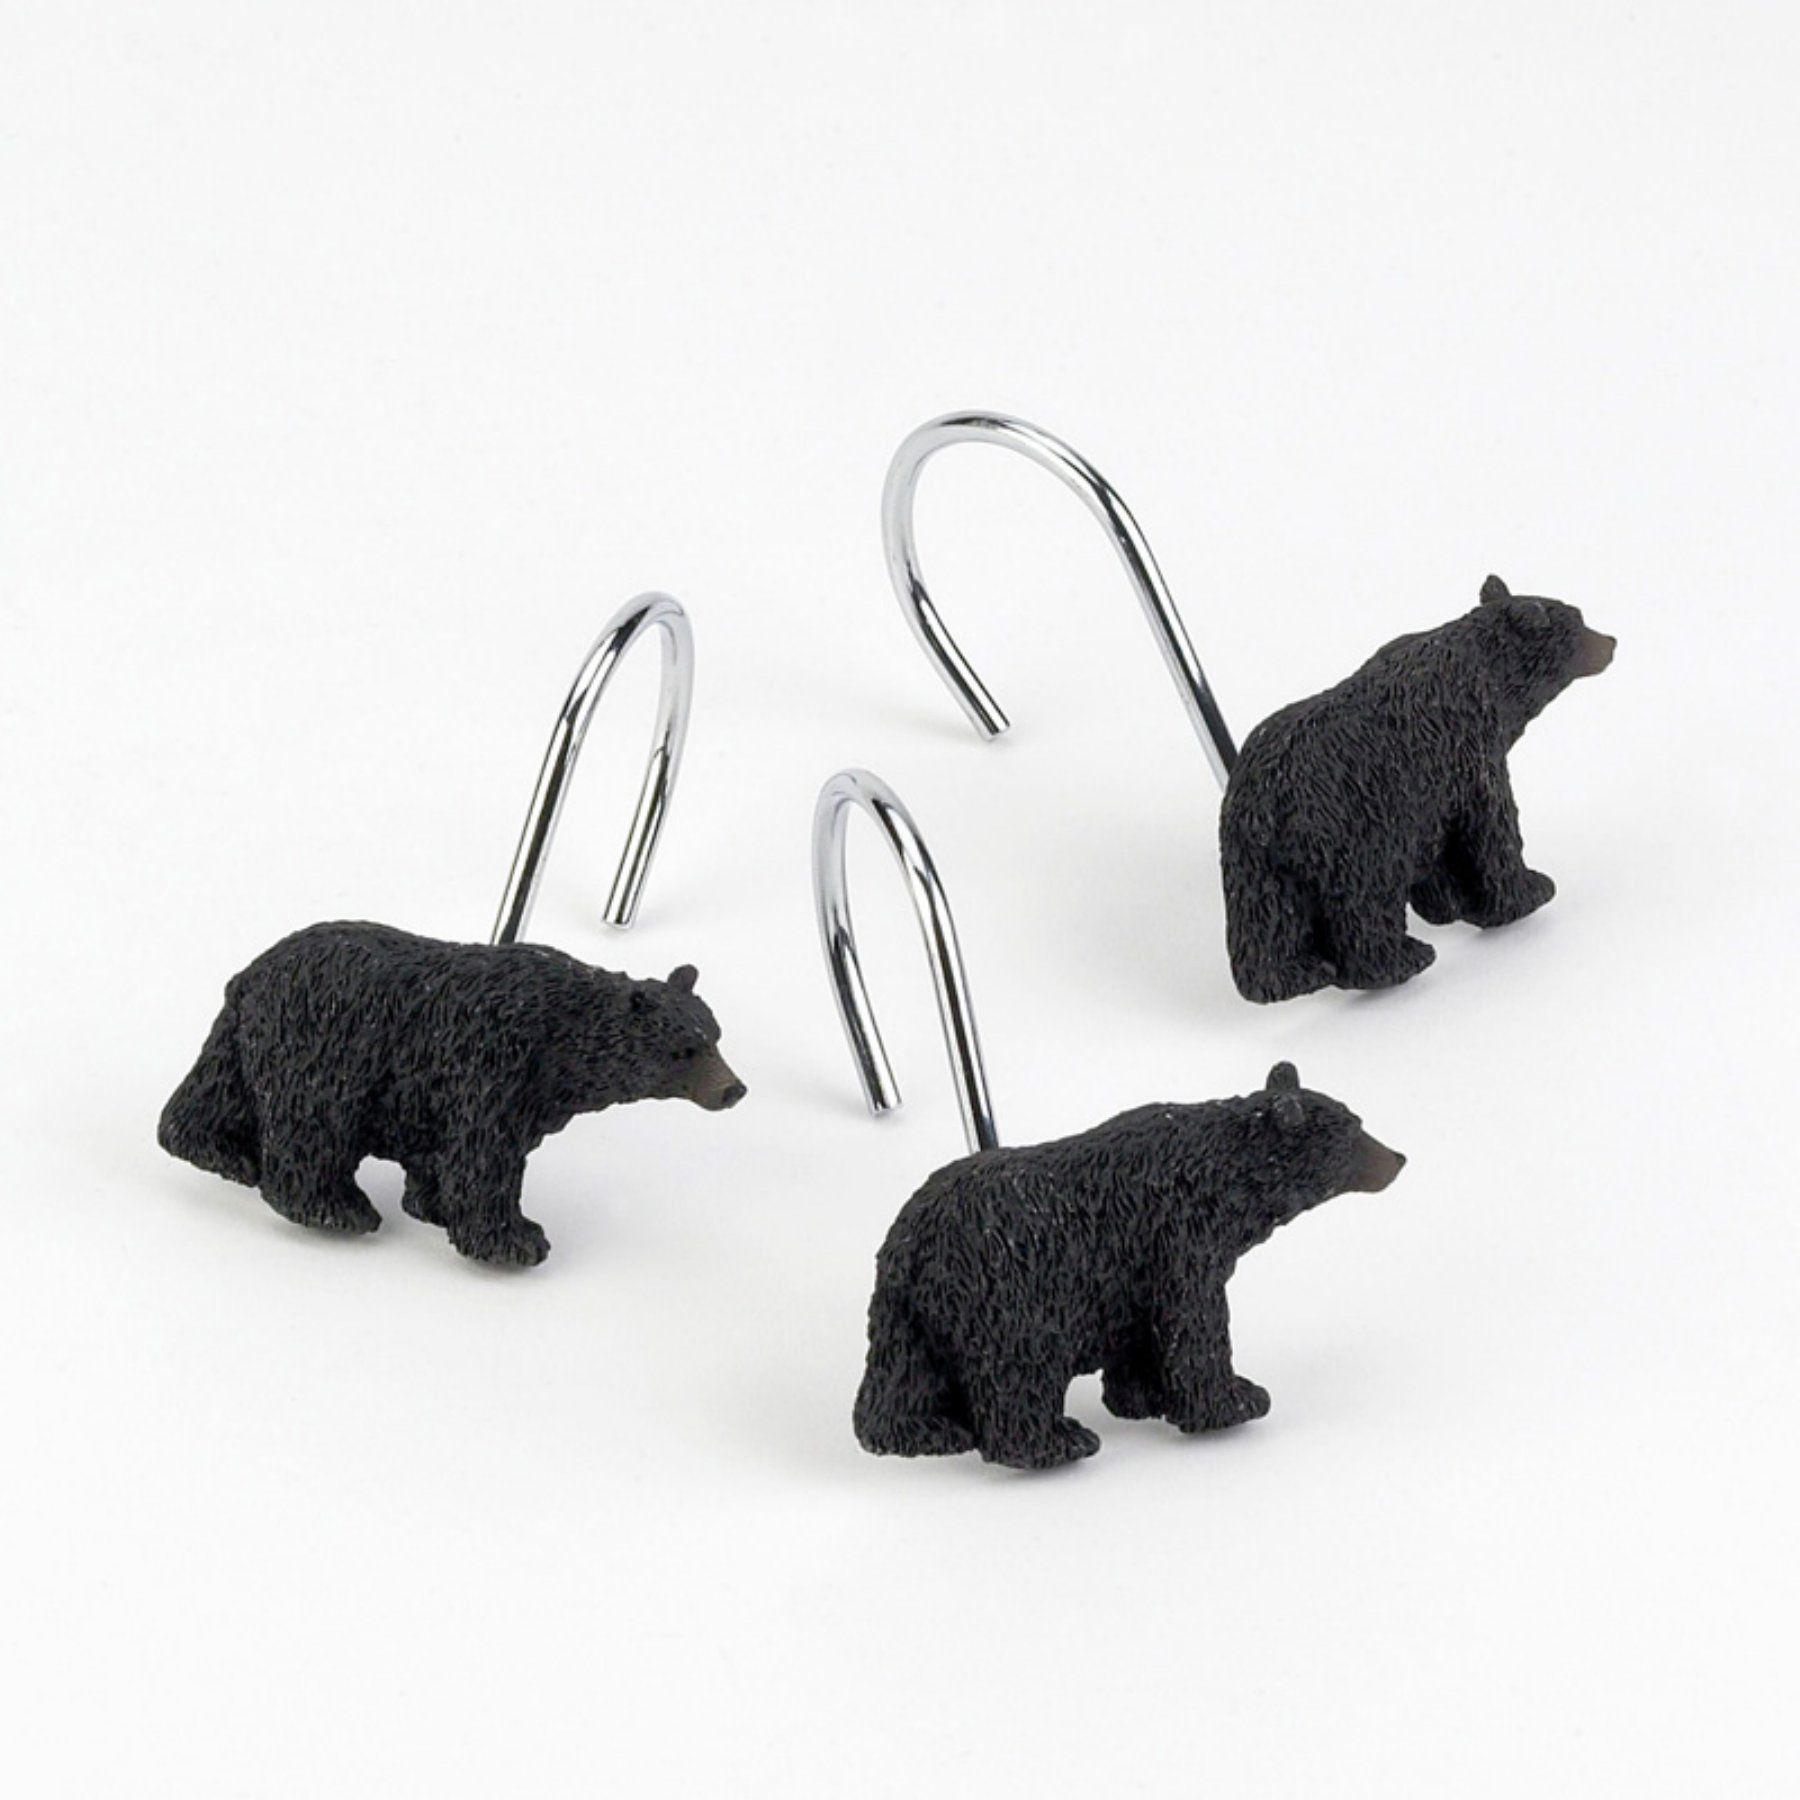 Avanti Linens Black Bear Lodge Shower Curtain Hooks Set of 12